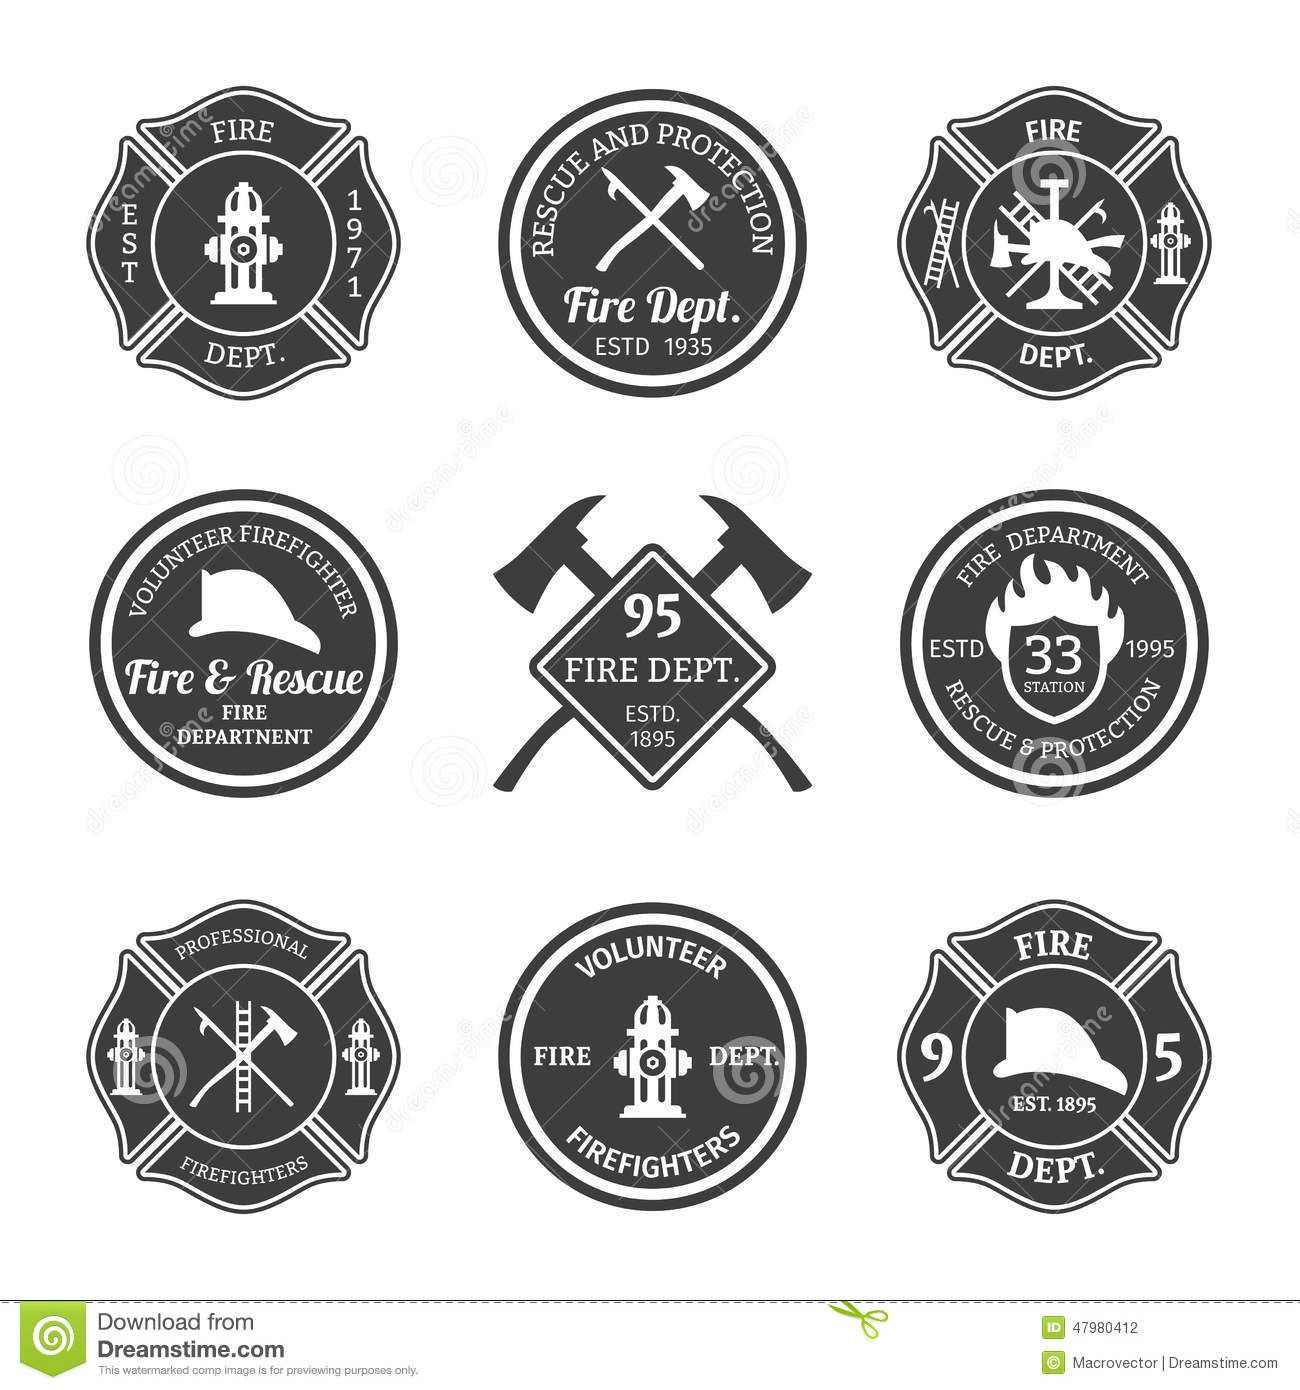 fire maltese cross vector Google Search Firefighter